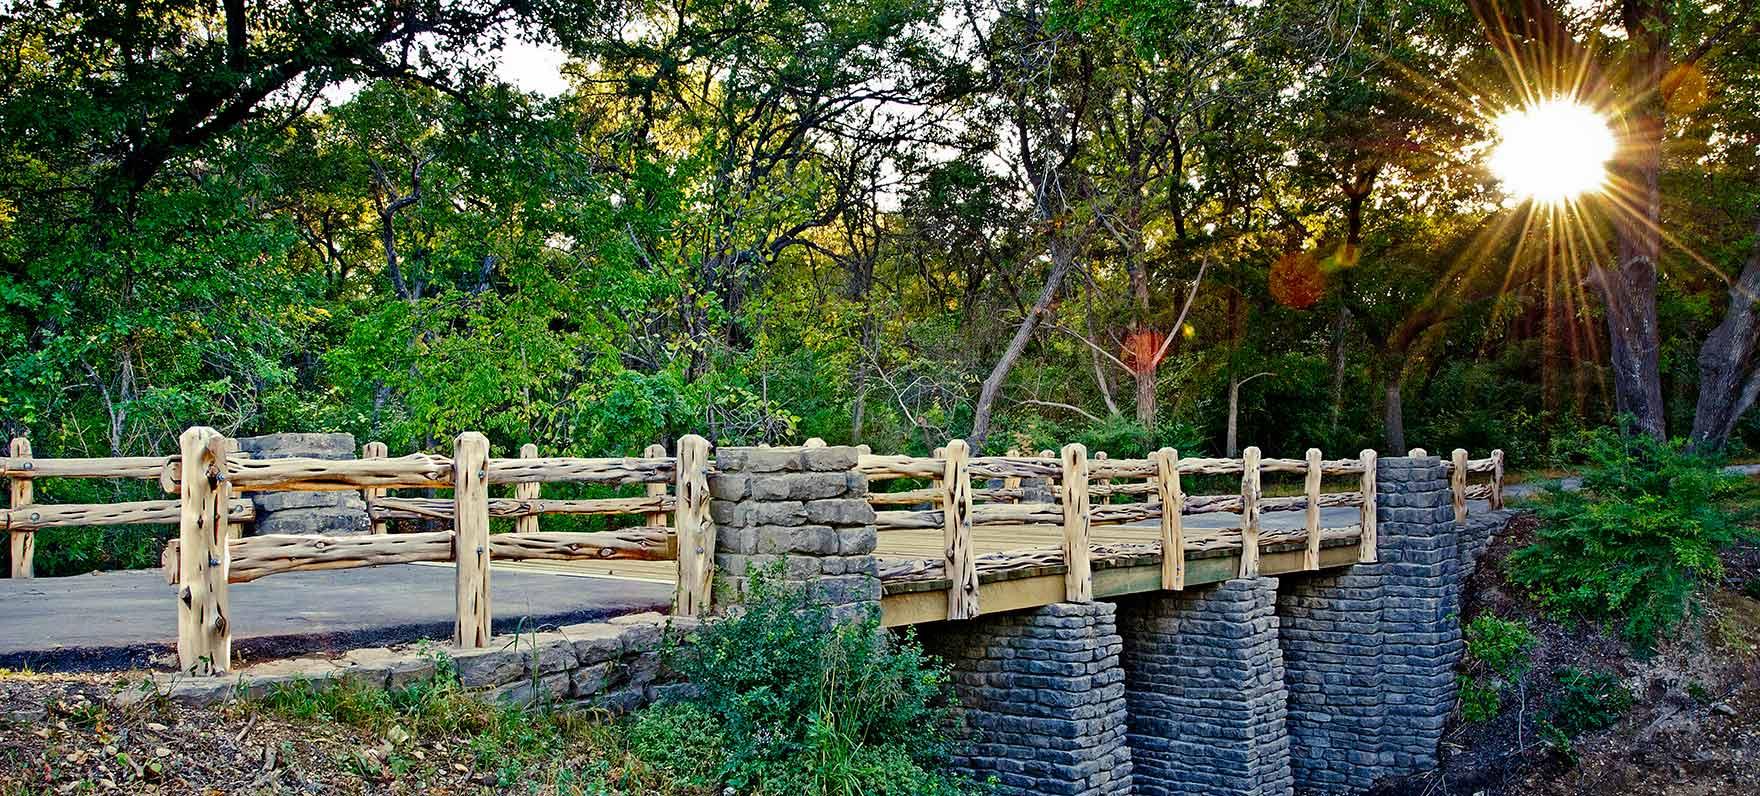 Cleburne State Park Texas Parks Amp Wildlife Department